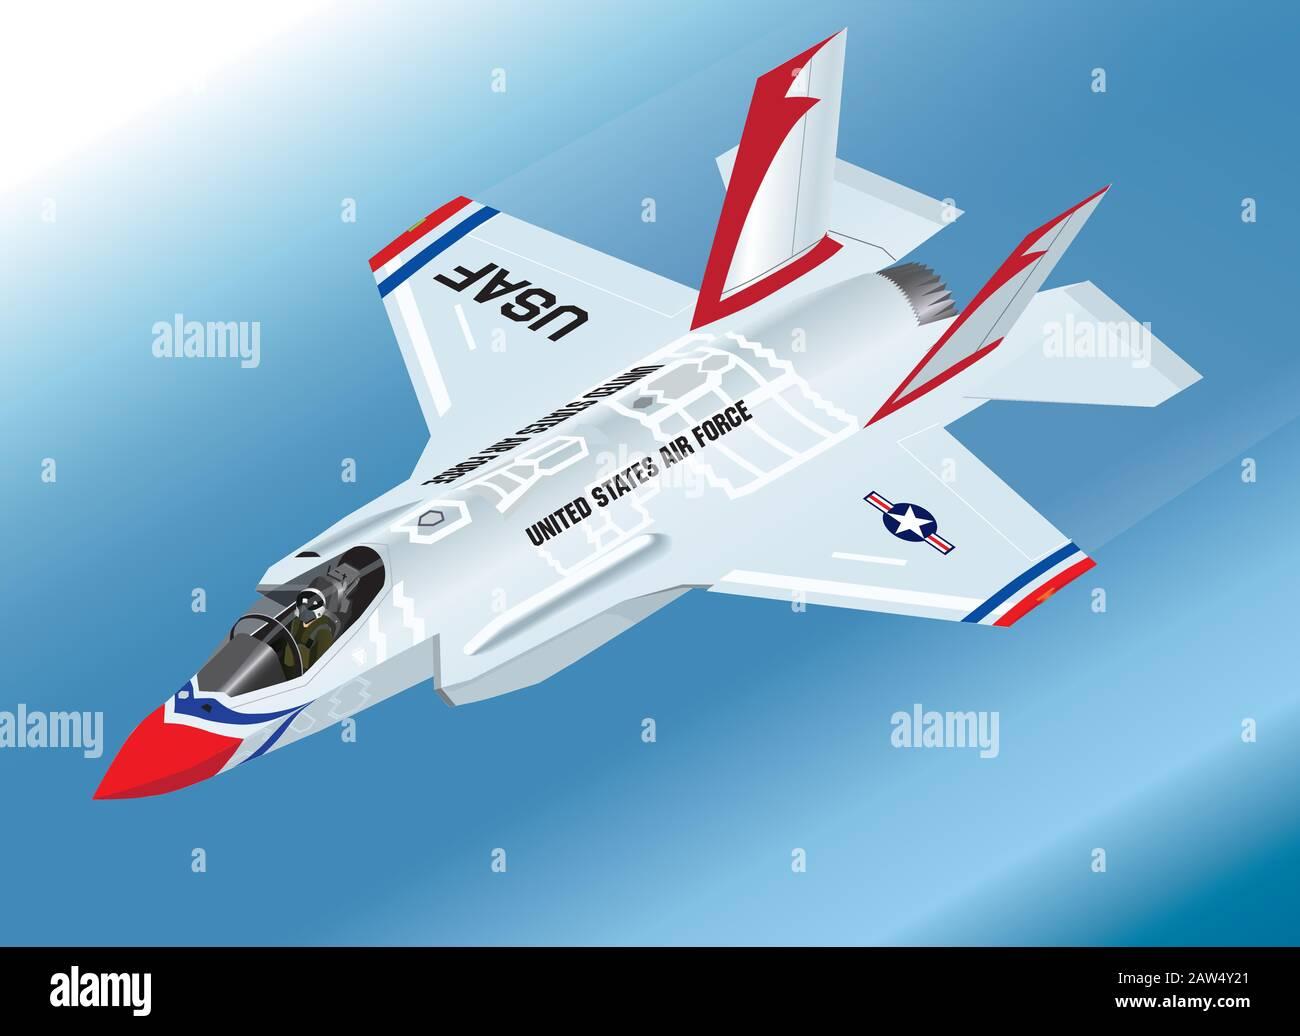 Detailed Isometric Vector Illustration of an airborne F-35 Lightning II Fighter Jet in Thunderbirds Aerobatic Team Paint Scheme Stock Vector